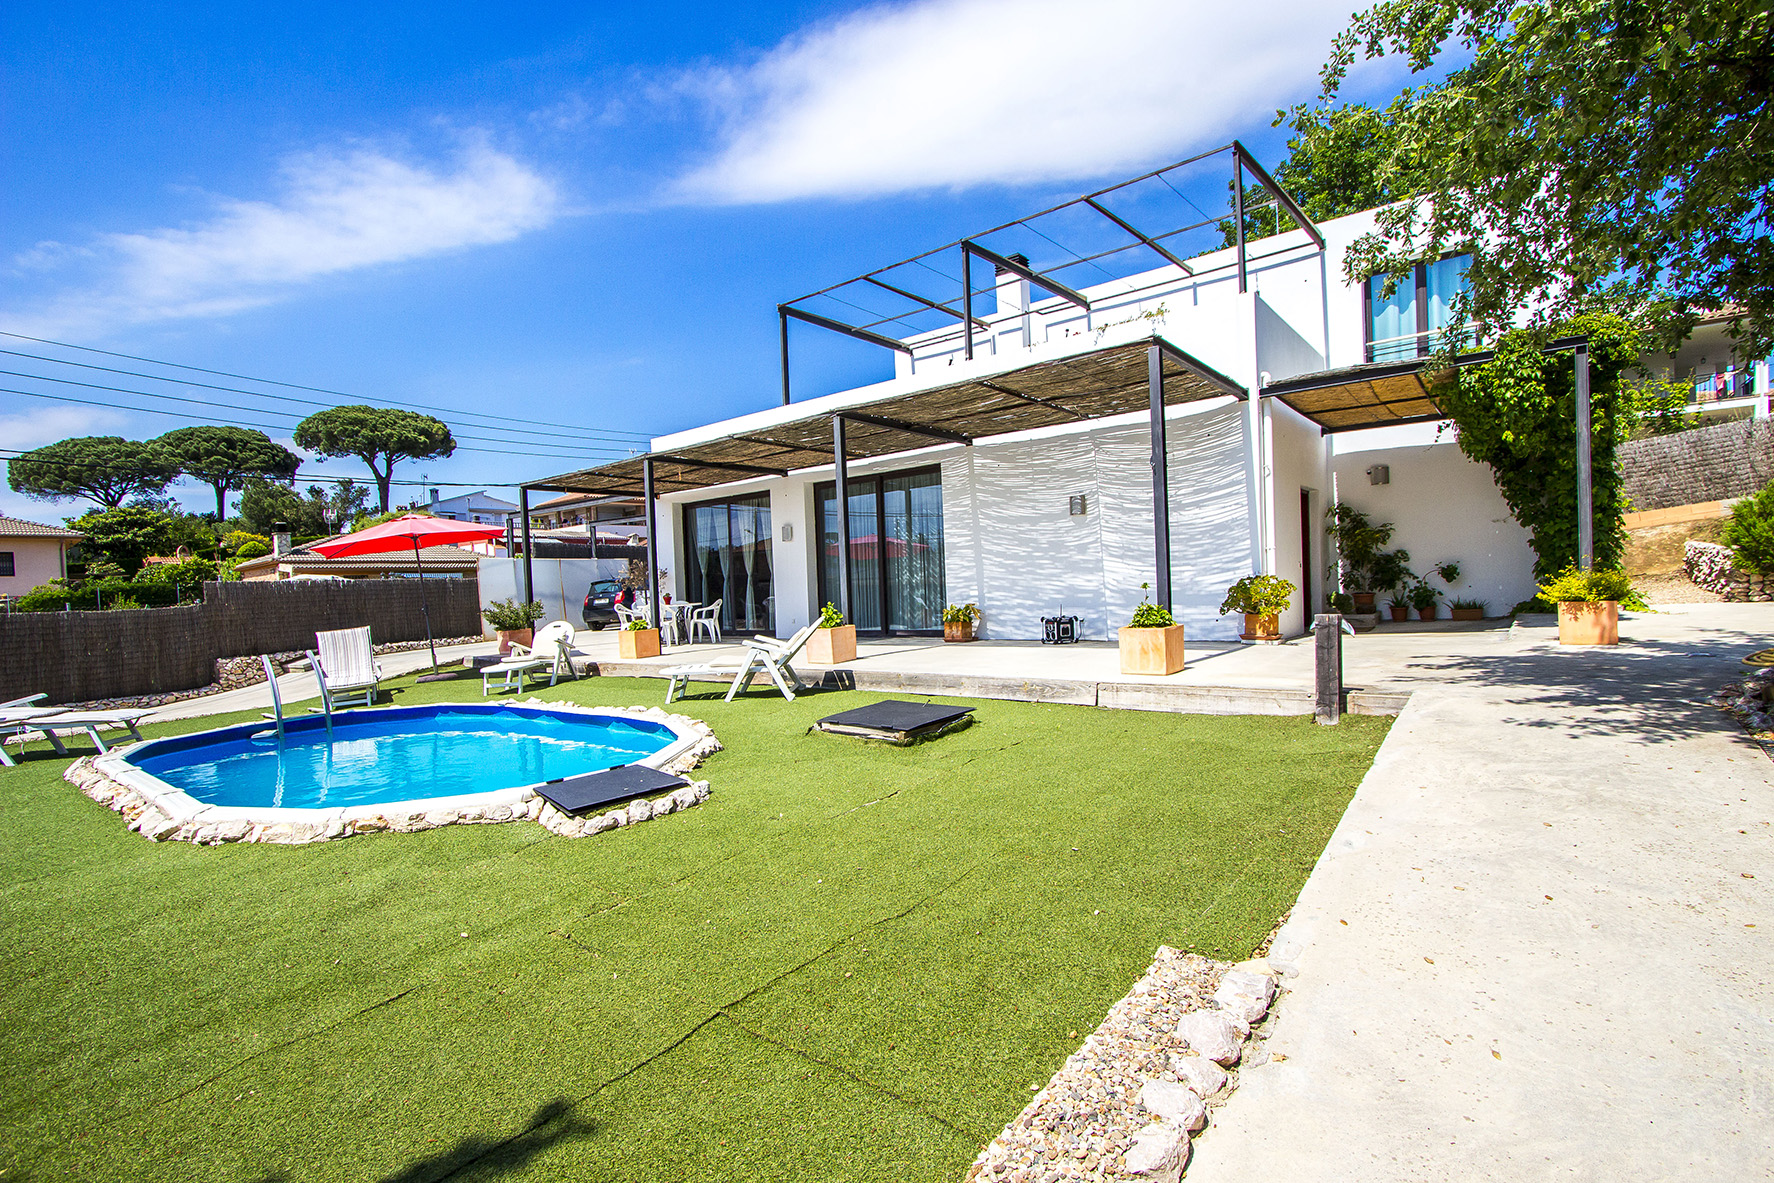 Ferienhaus Catalunya Casas: Serene villa in Sils, 20 km to Costa Brava beaches! (1890922), Les Mallorquines, Girona, Katalonien, Spanien, Bild 1